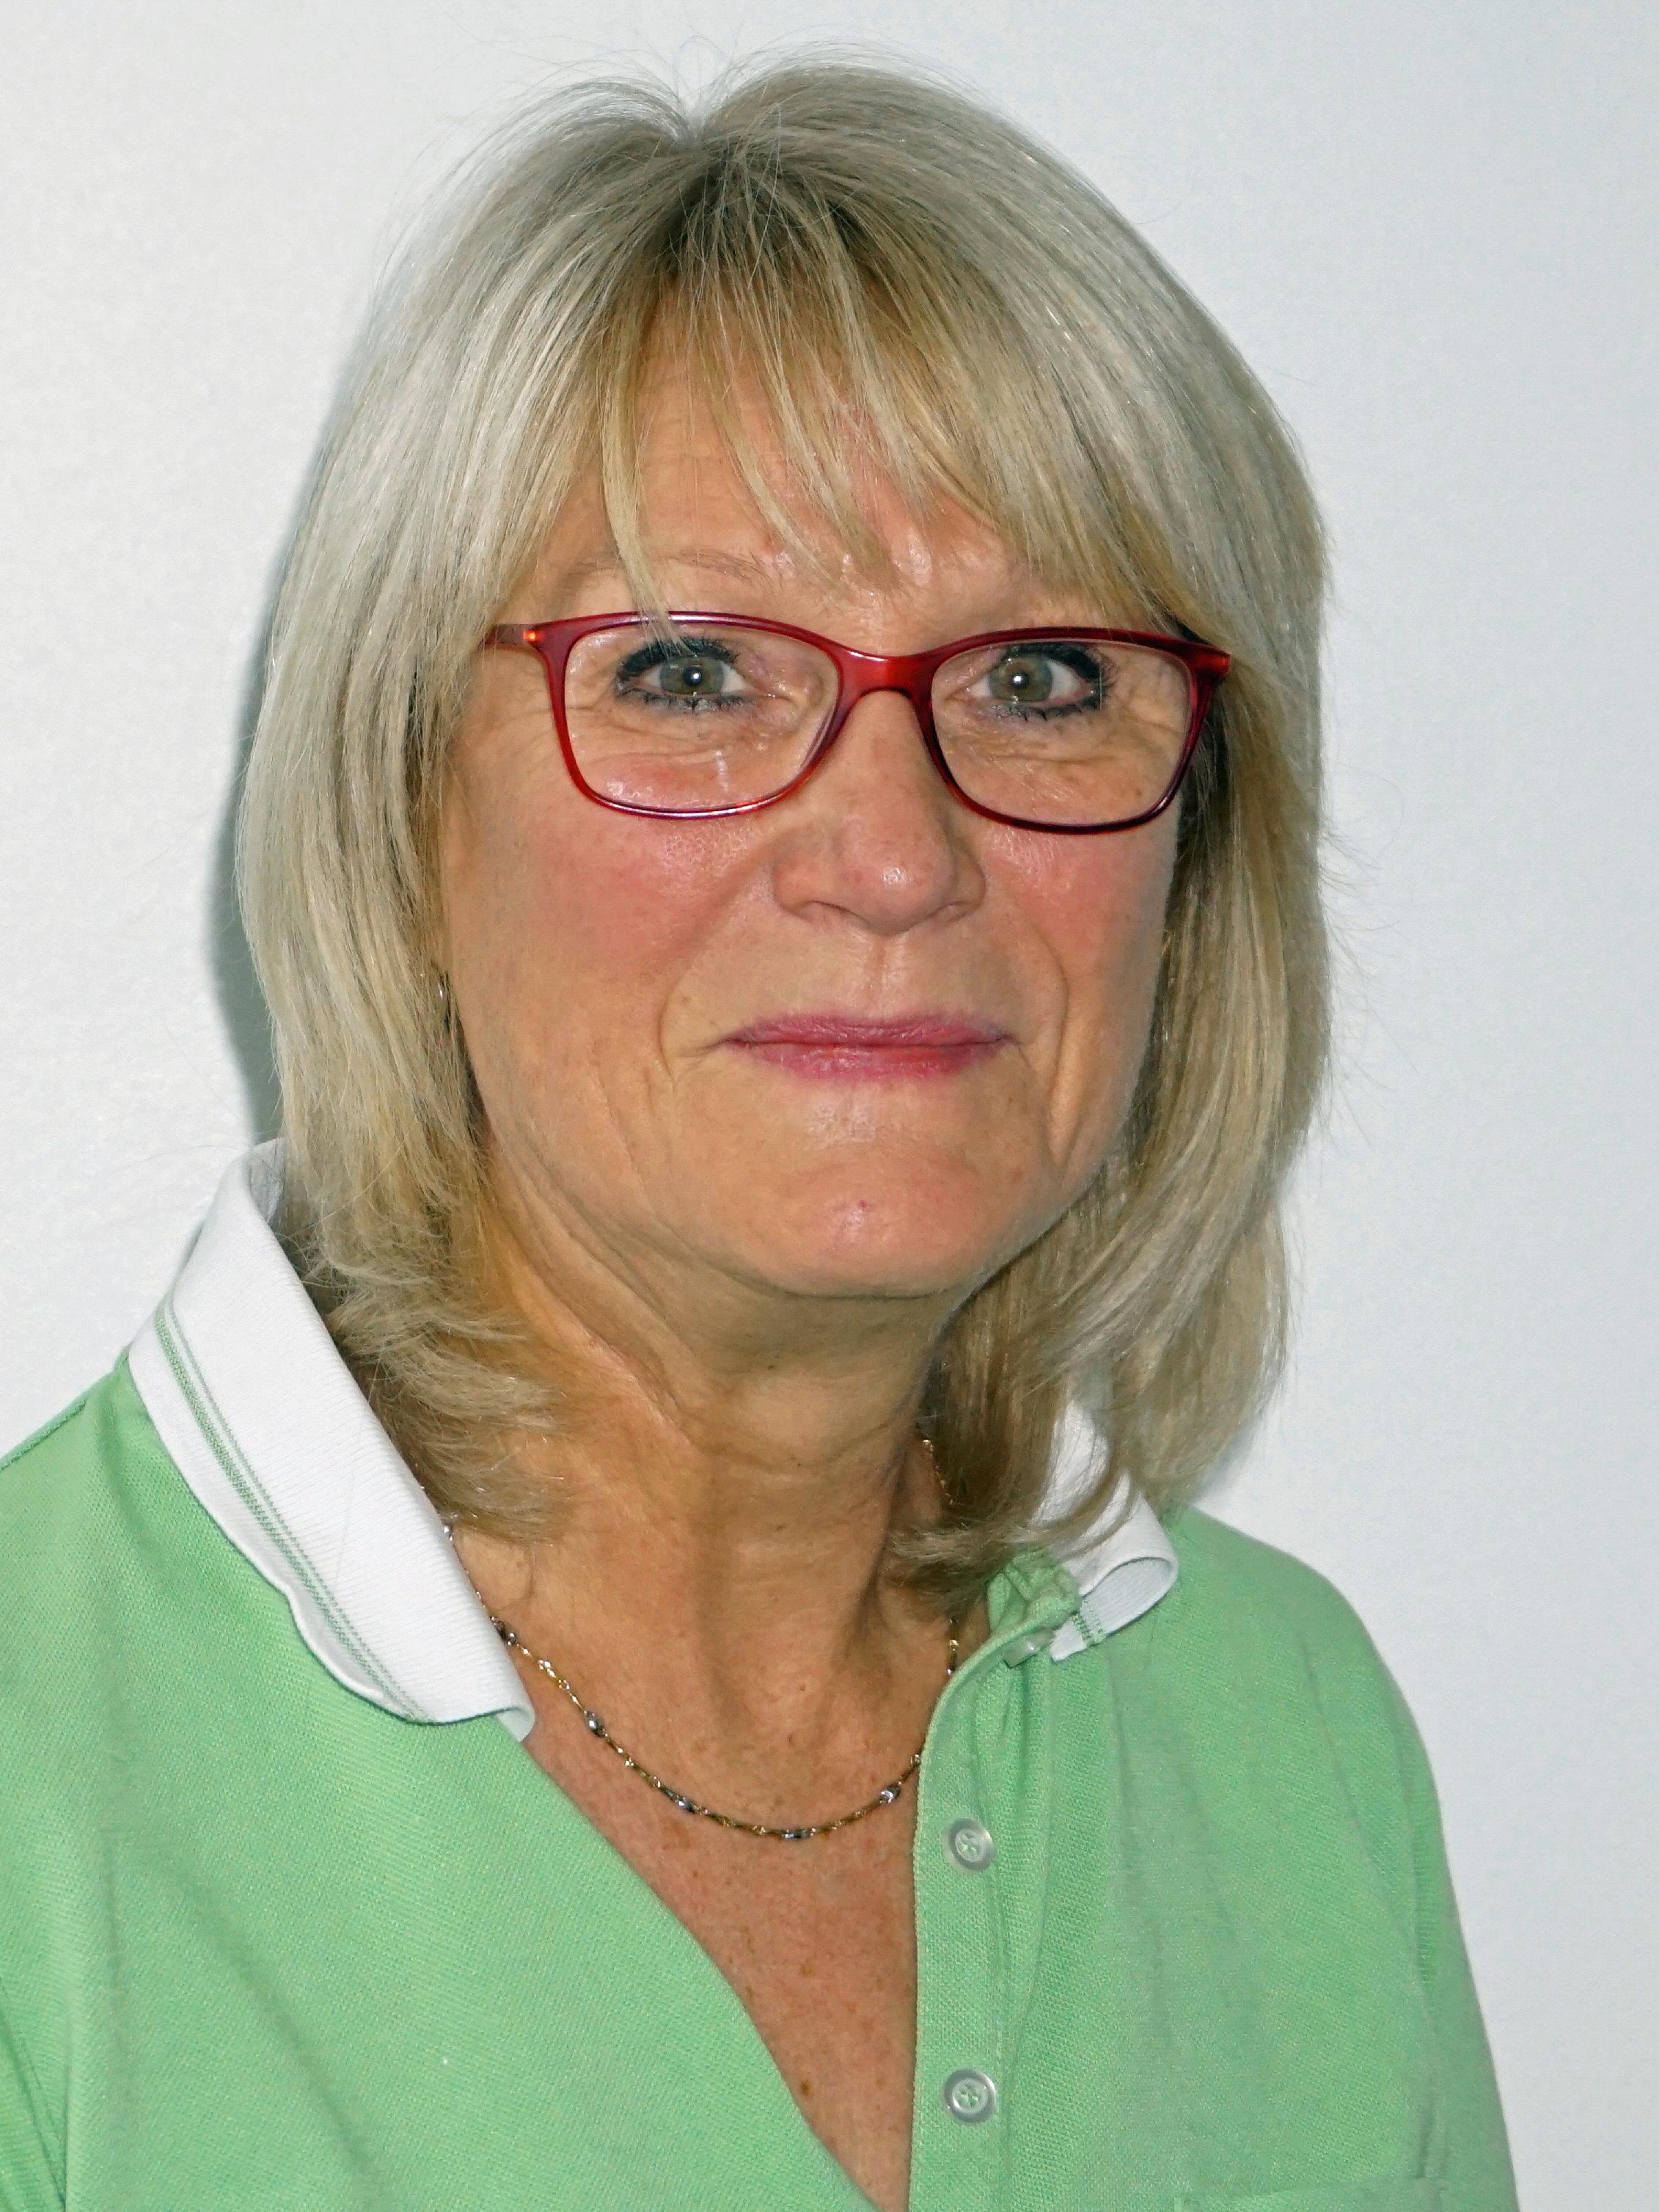 Frau Richter